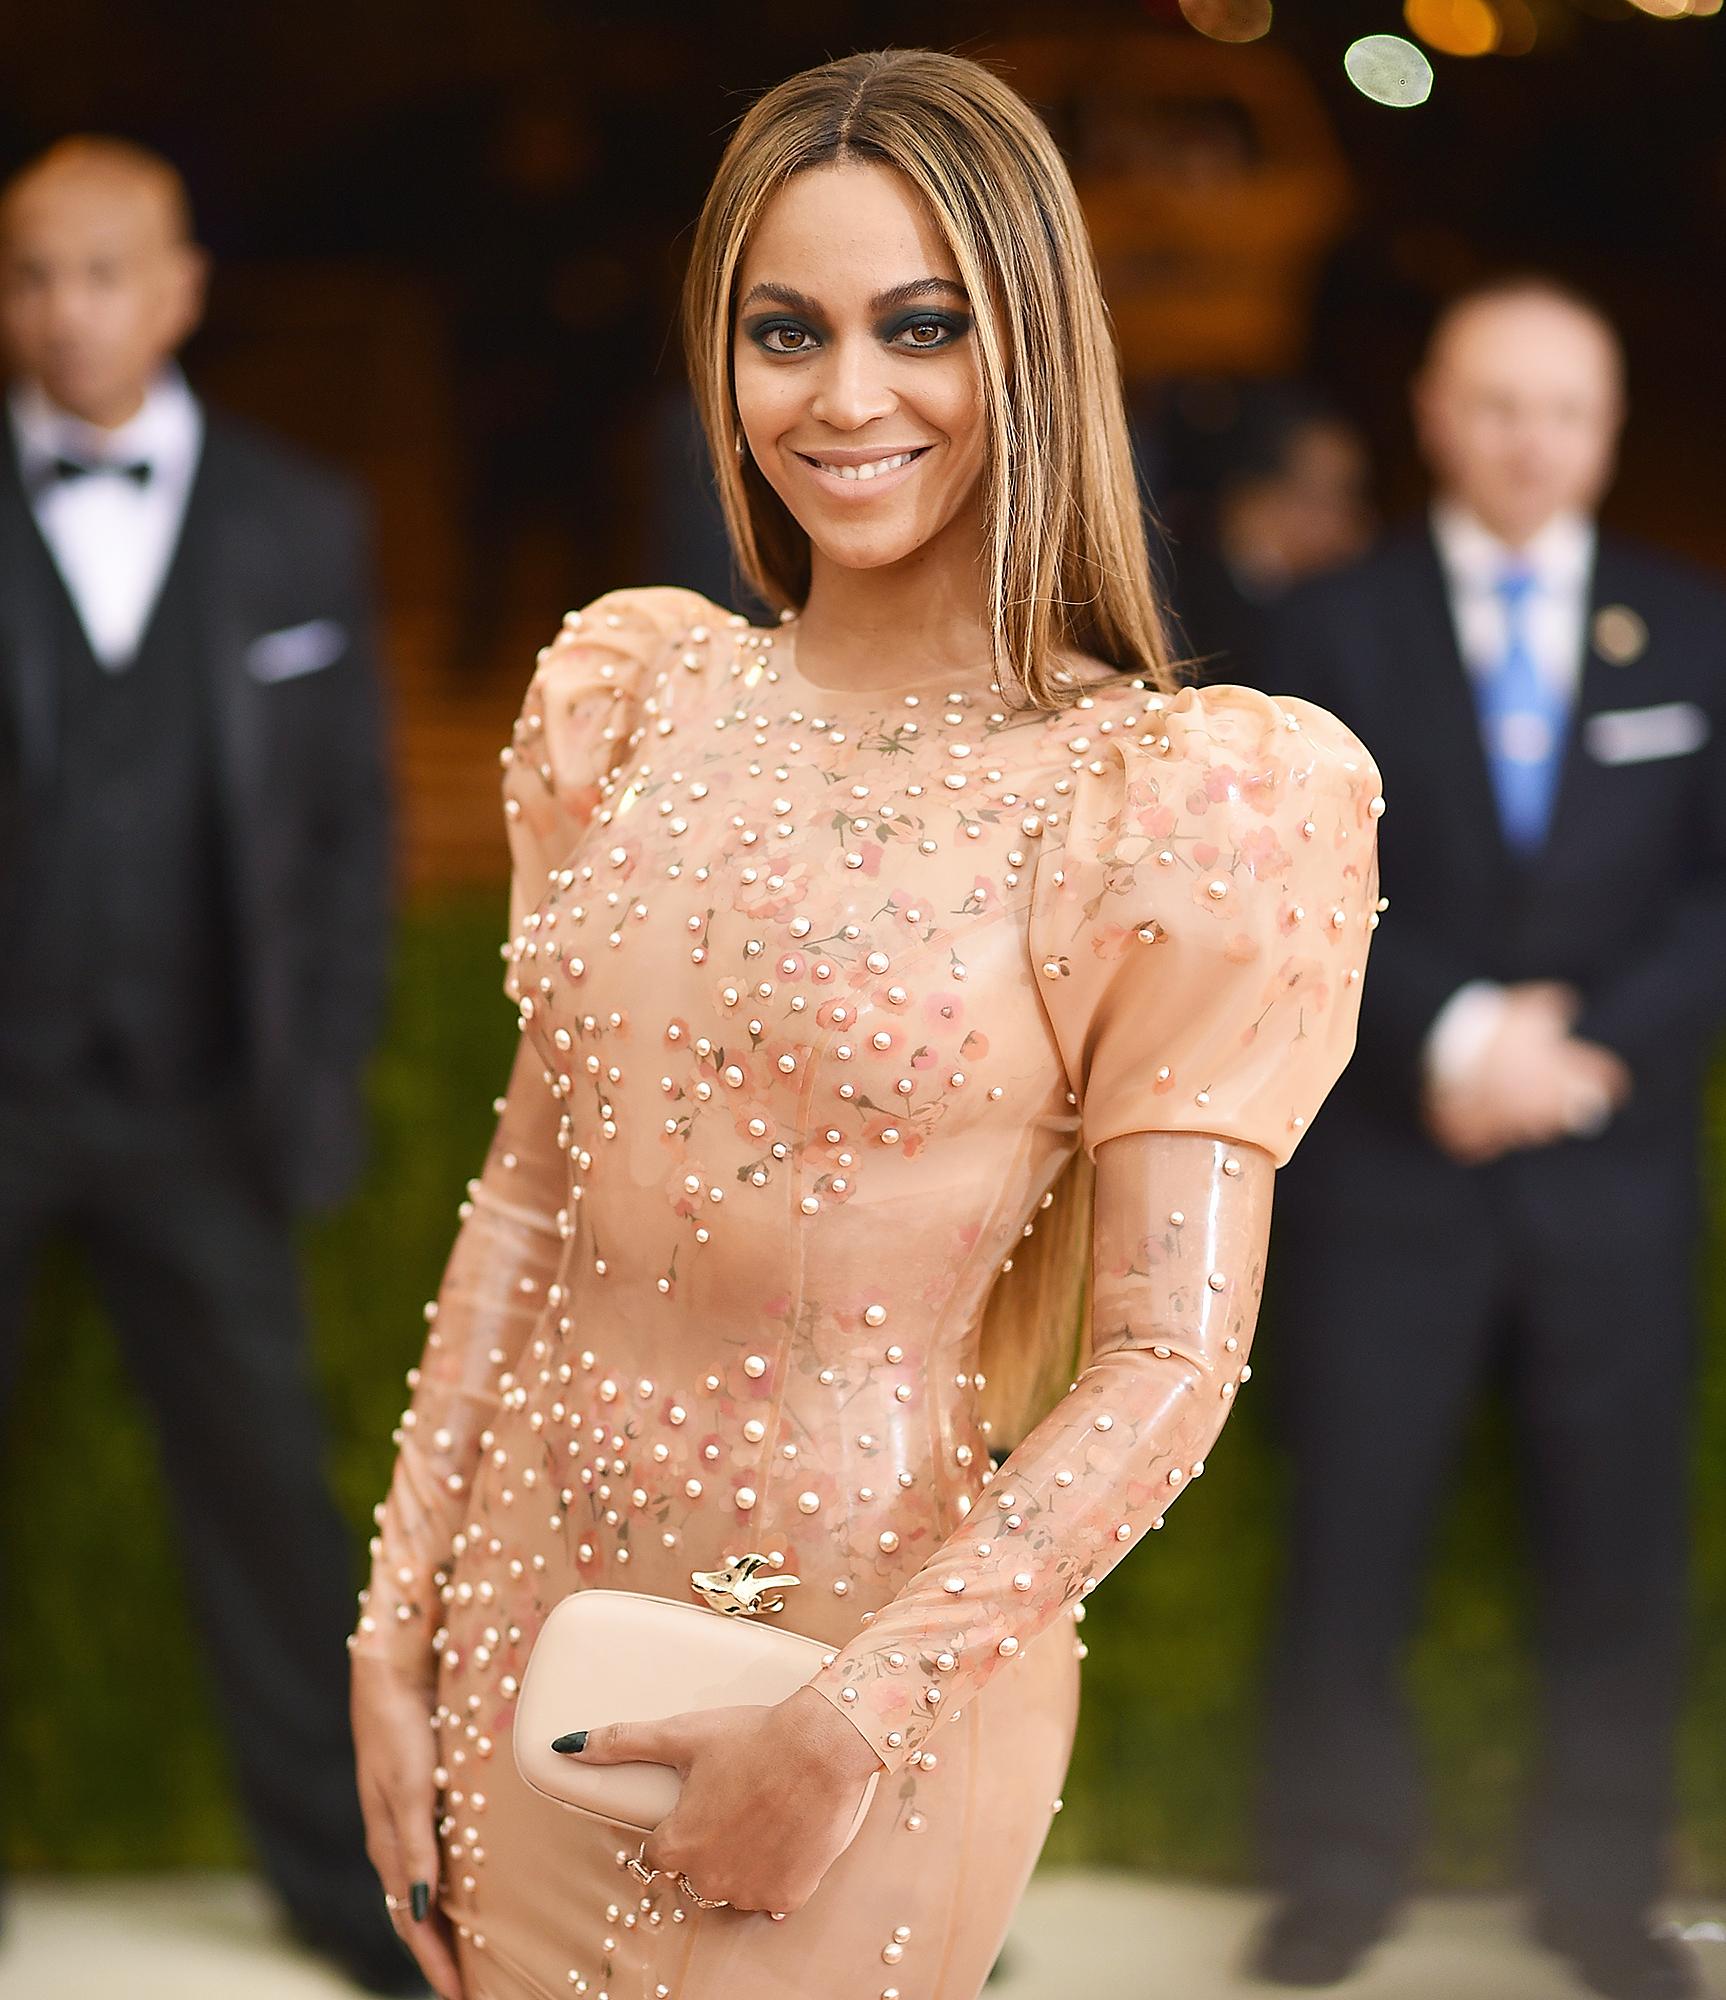 Zach Braff Teases He Bit Beyonce